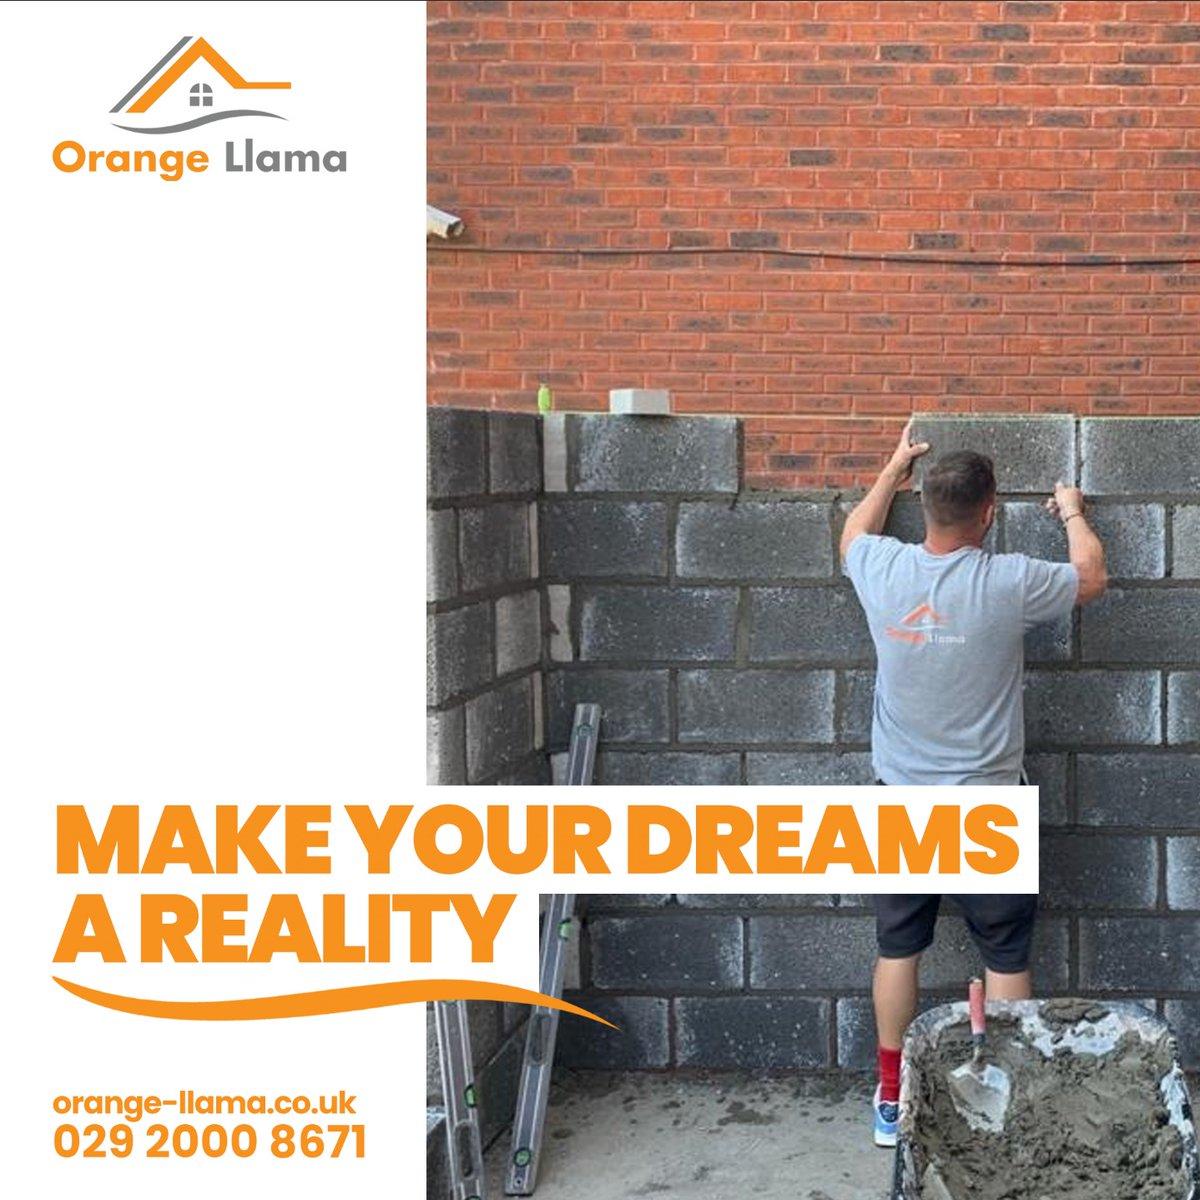 "Afternoon everyone    #HappySunday   ""Make your dreams a reality"" #Orange #Llamapic.twitter.com/vmgKsHCcTo"